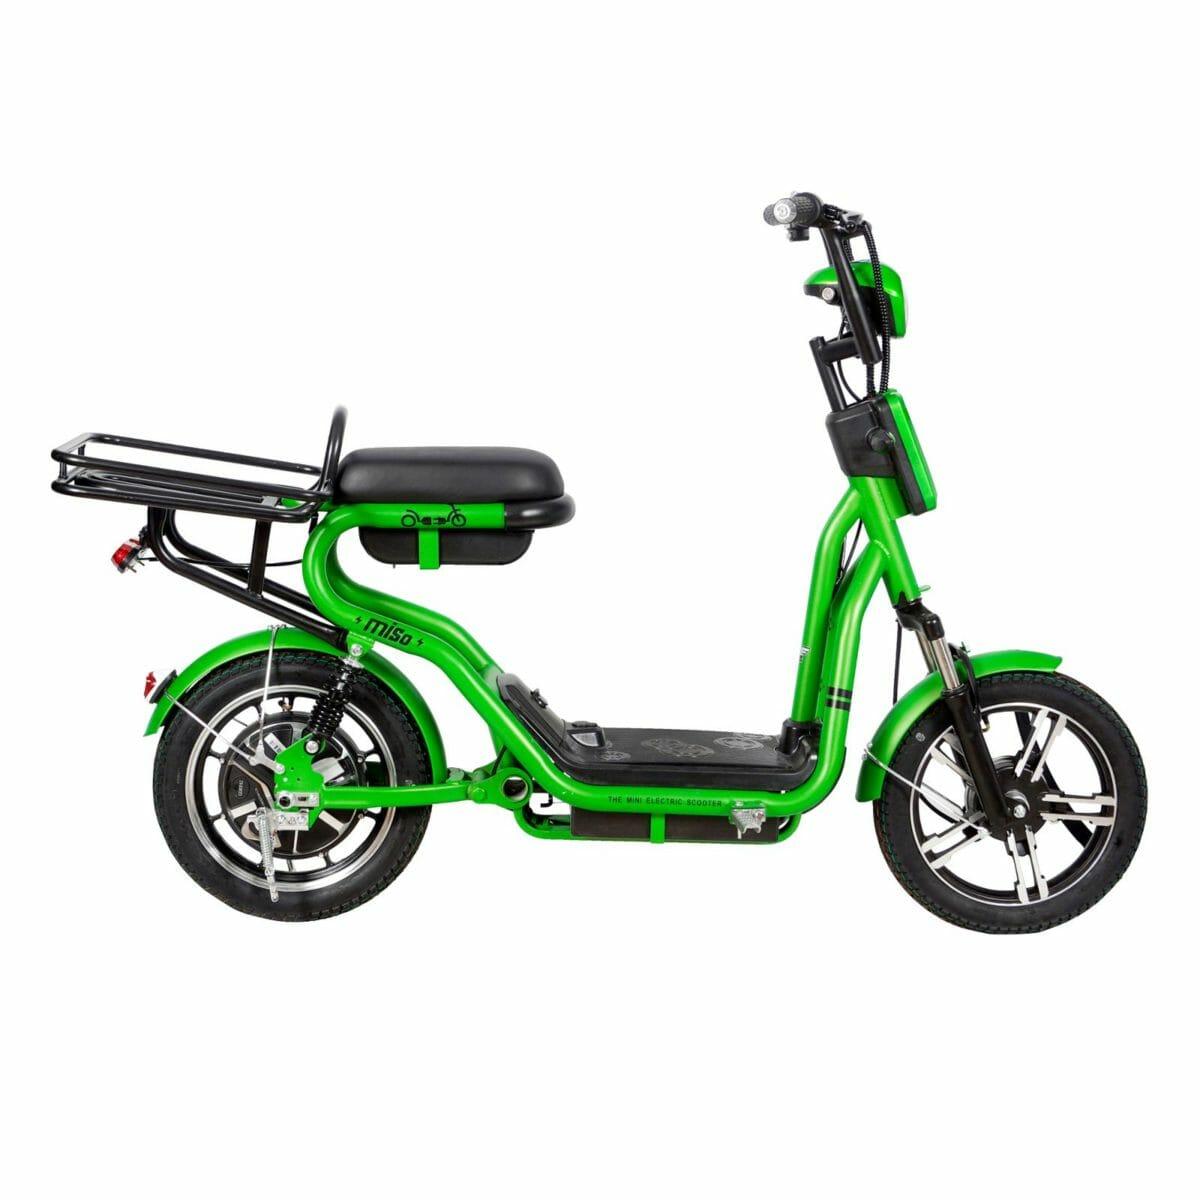 Gemopai Miso scooter1 (1)